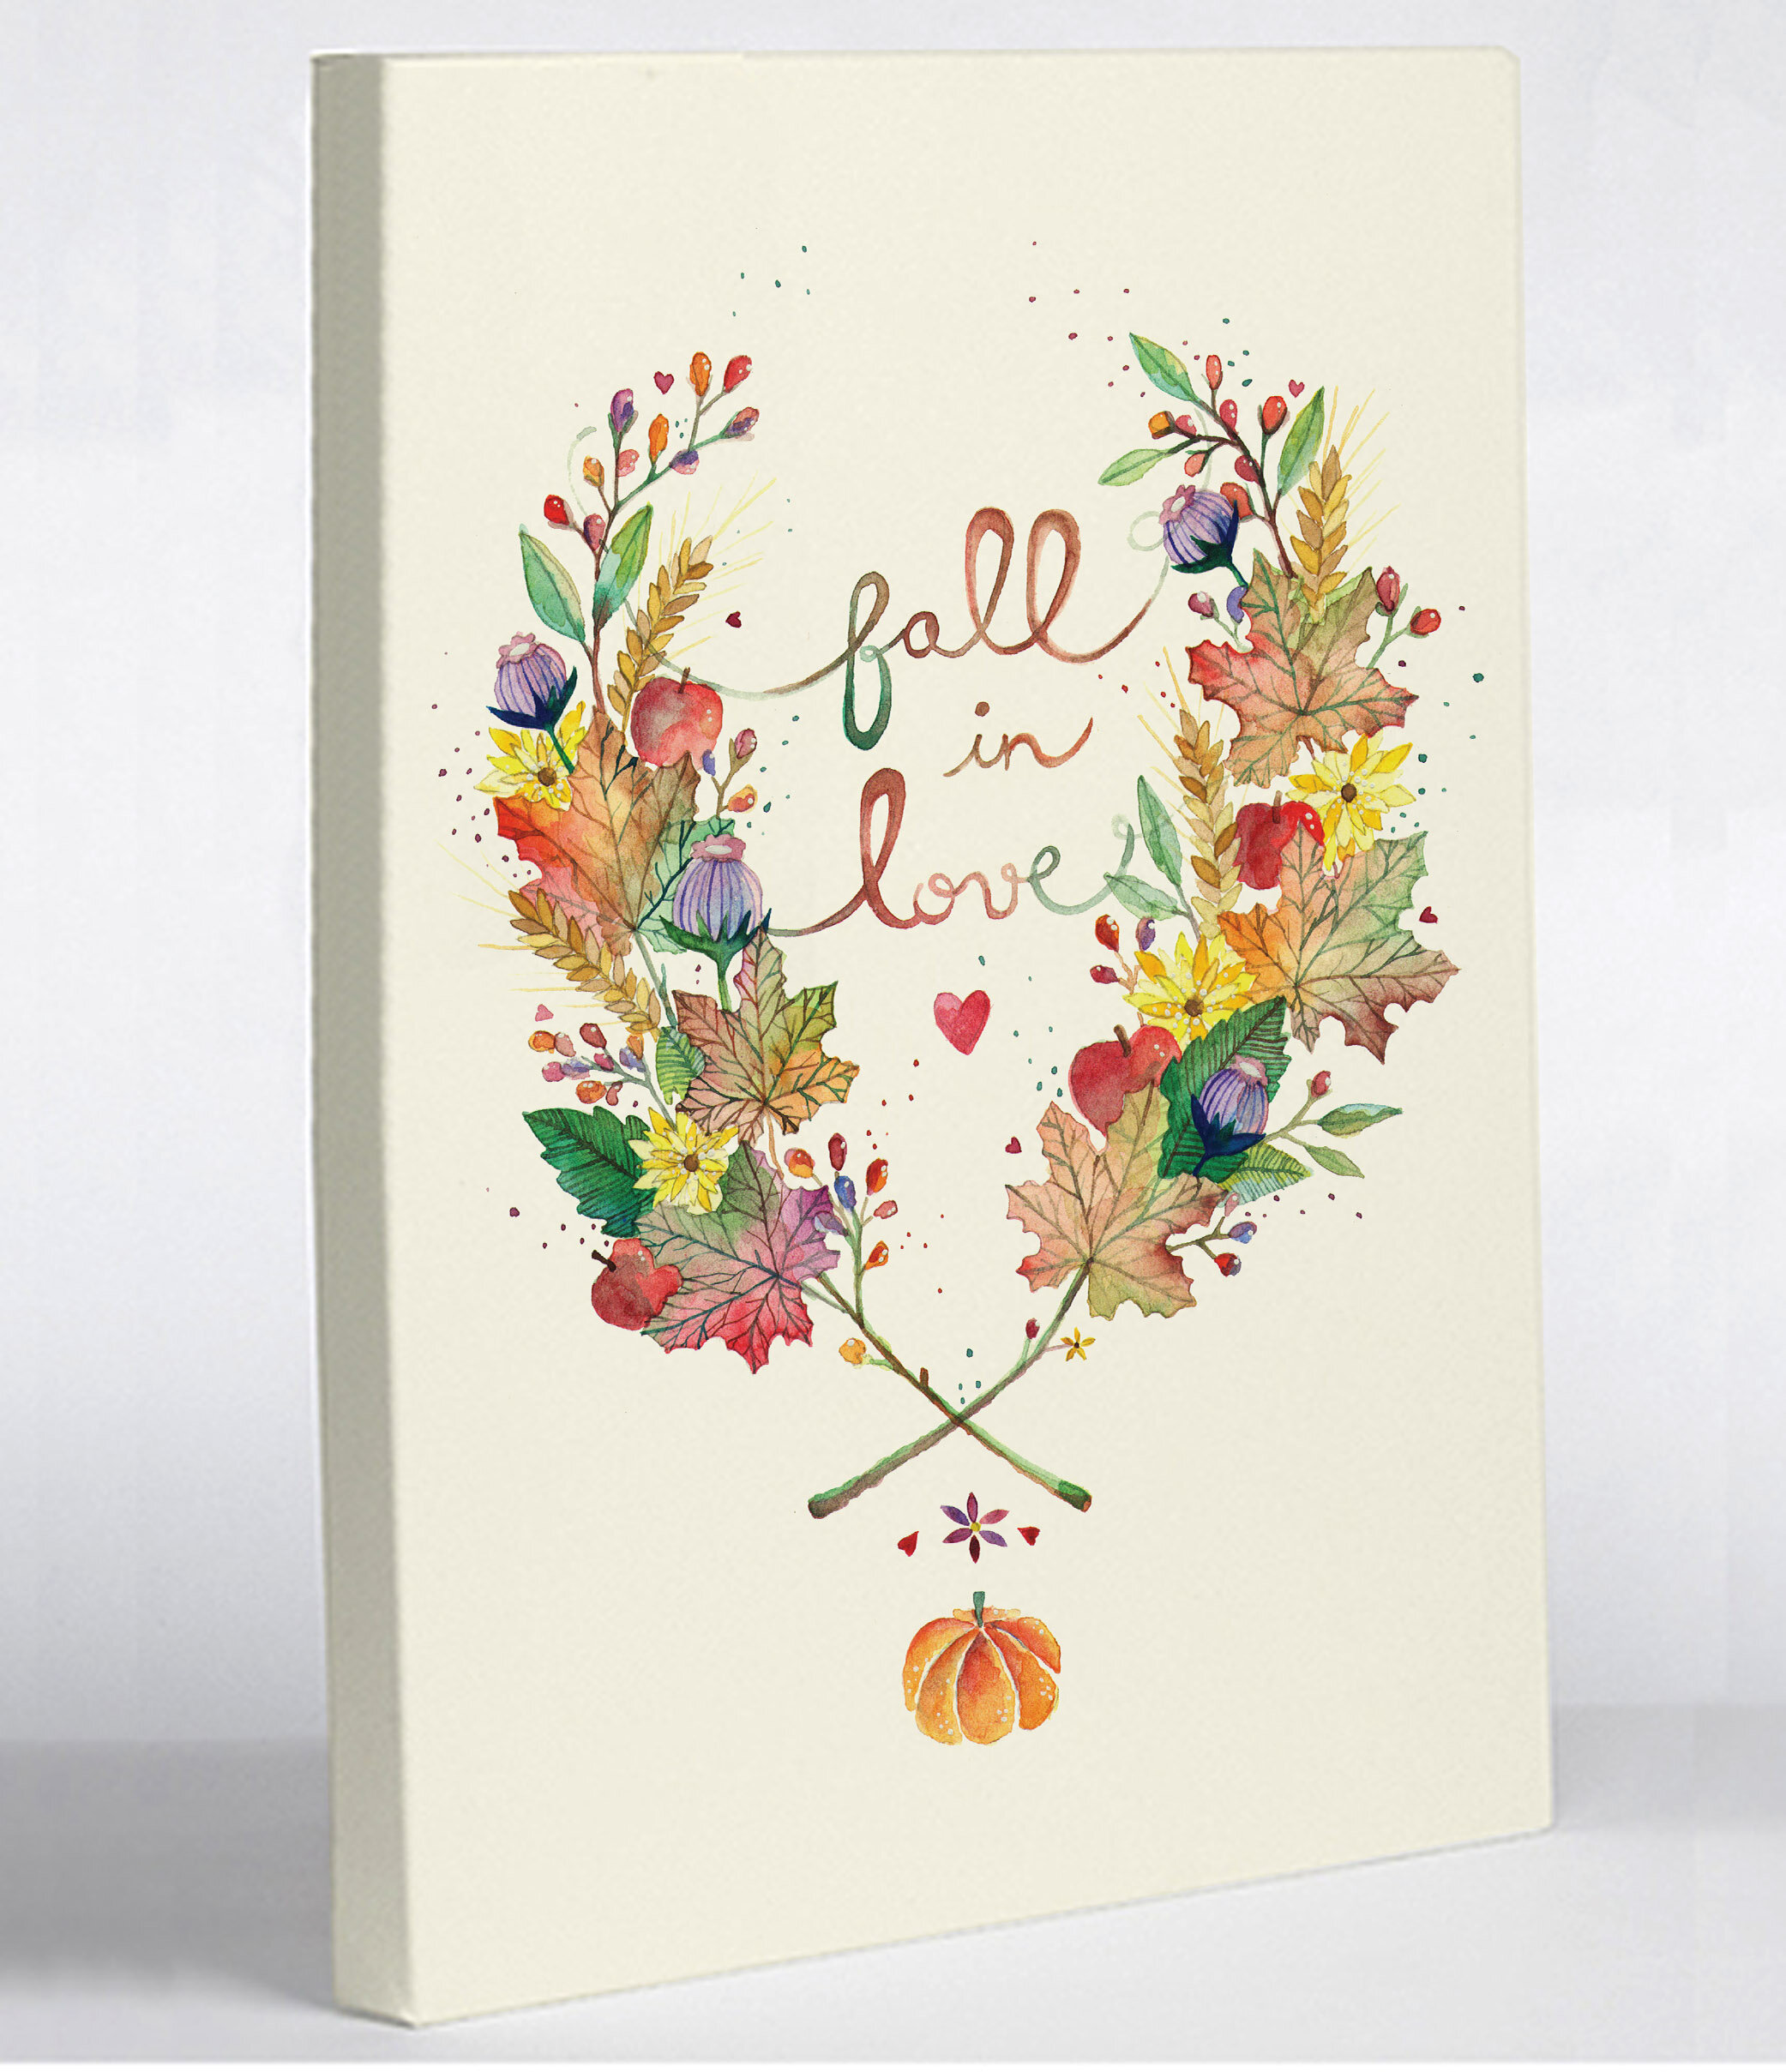 One Bella Casa Fall In Love Ana Victoria Calderon Graphic Art On Wrapped Canvas Wayfair